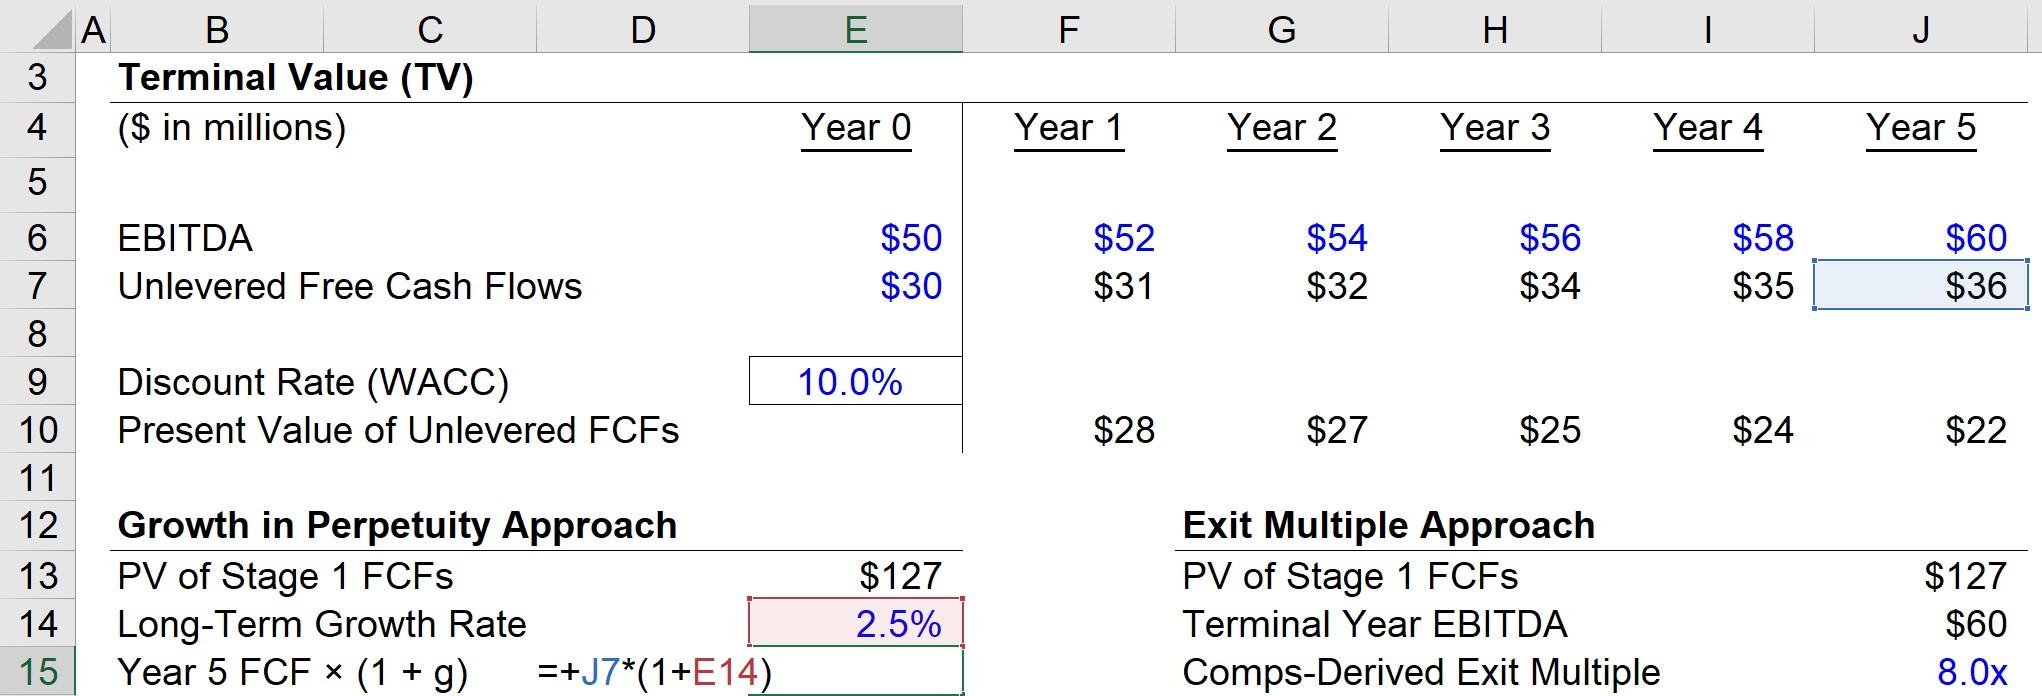 Year 5 Terminal Value